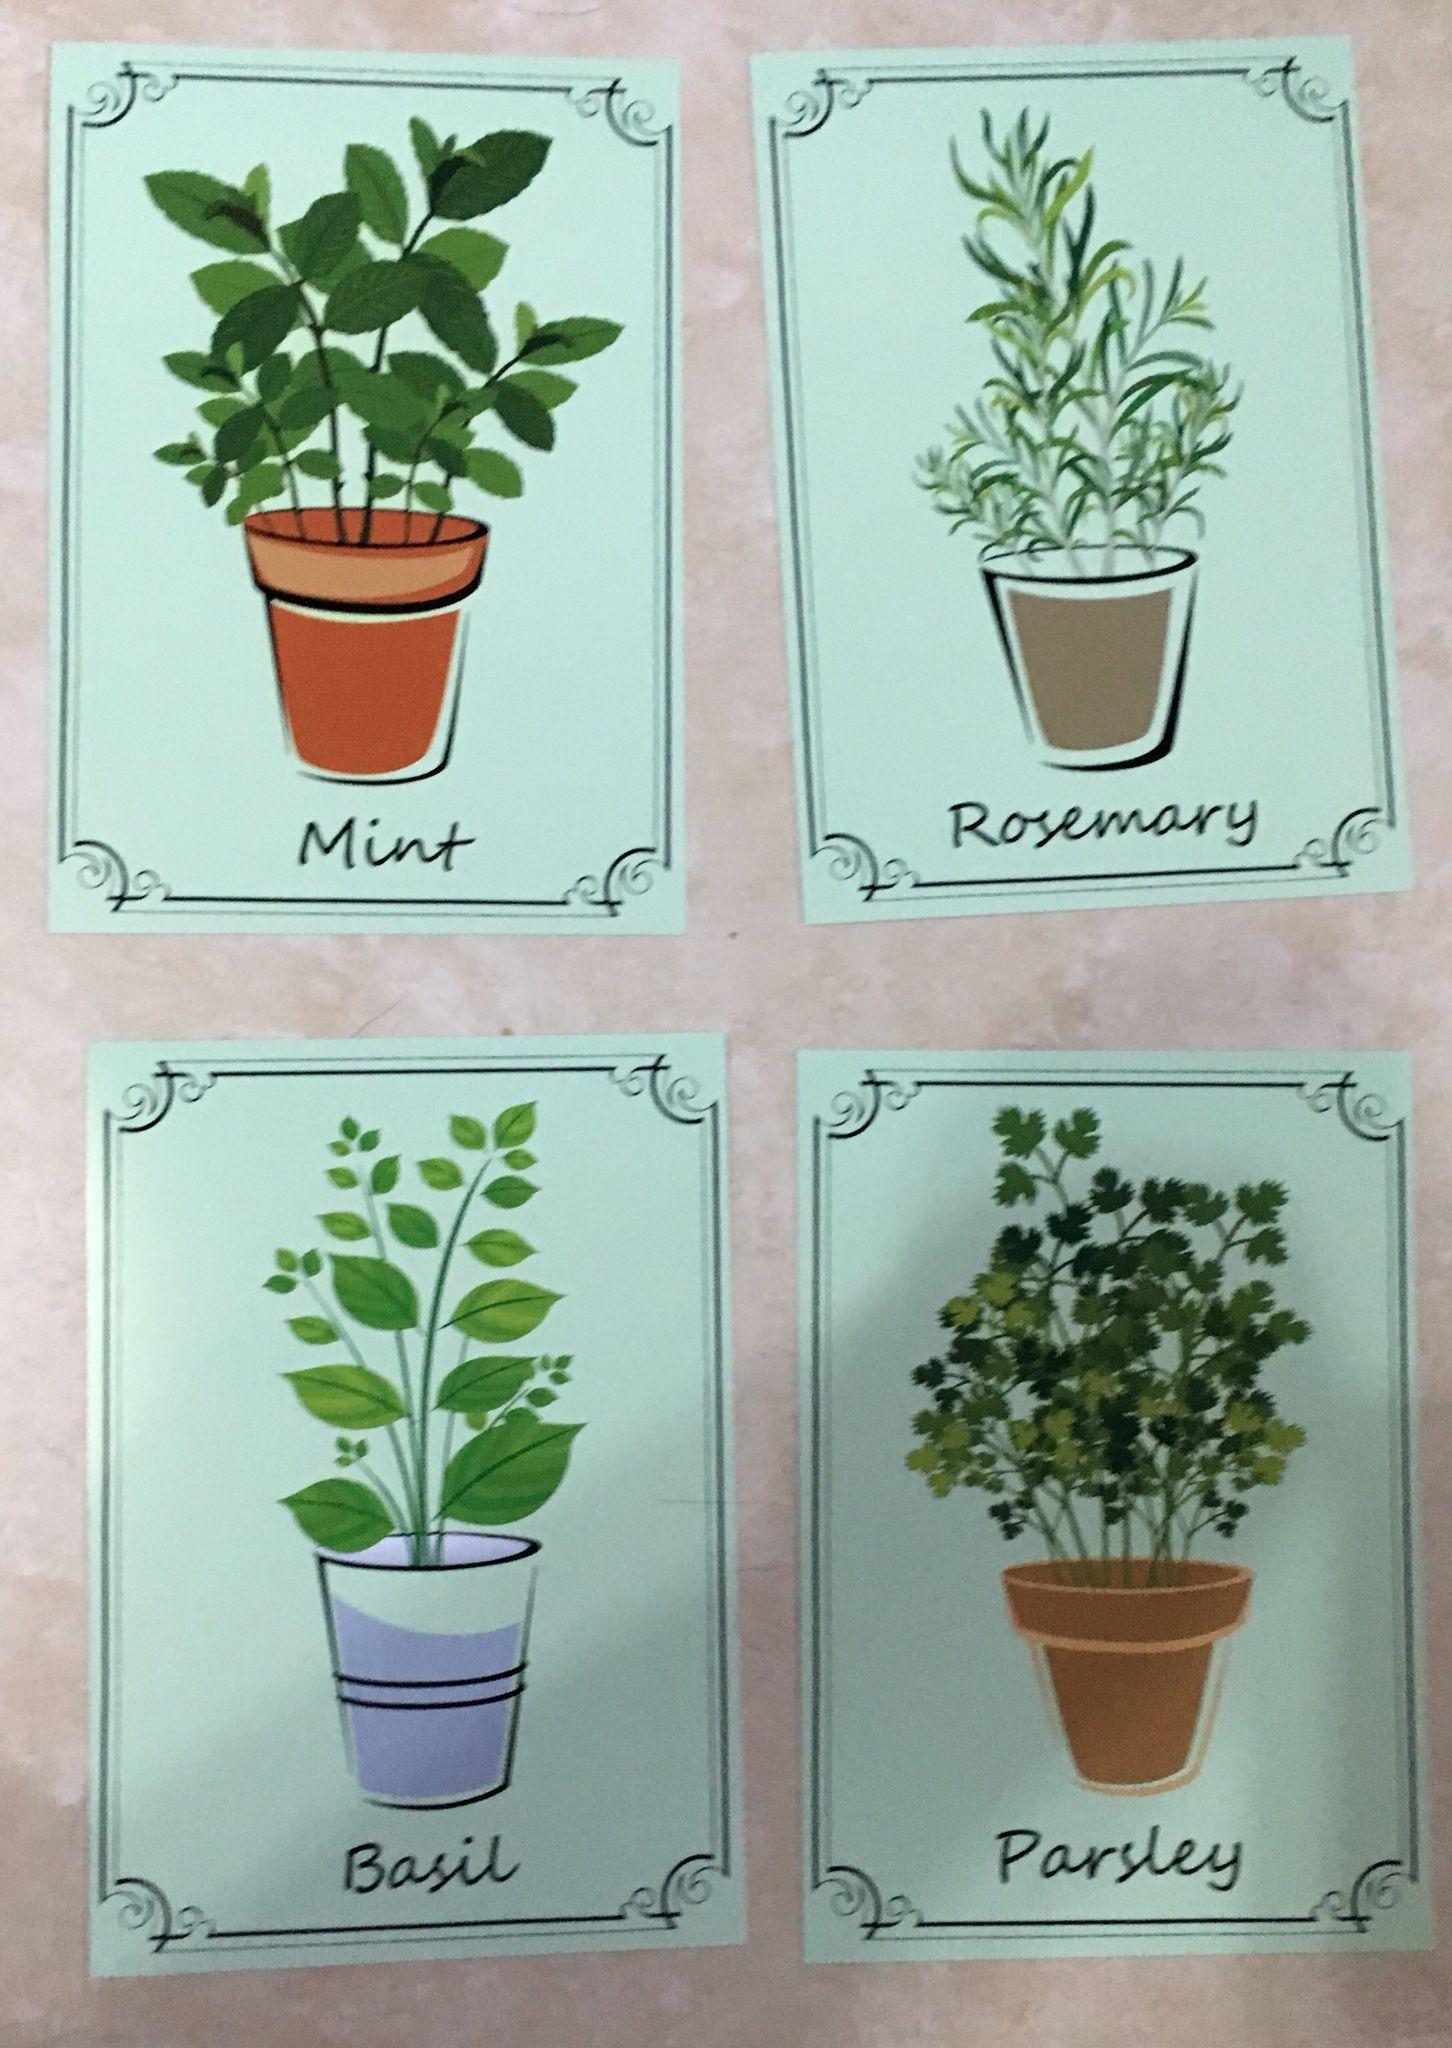 Herb Pots Wall Art Prints - Decorative Kitchen Decor (5x7, Green) by ...